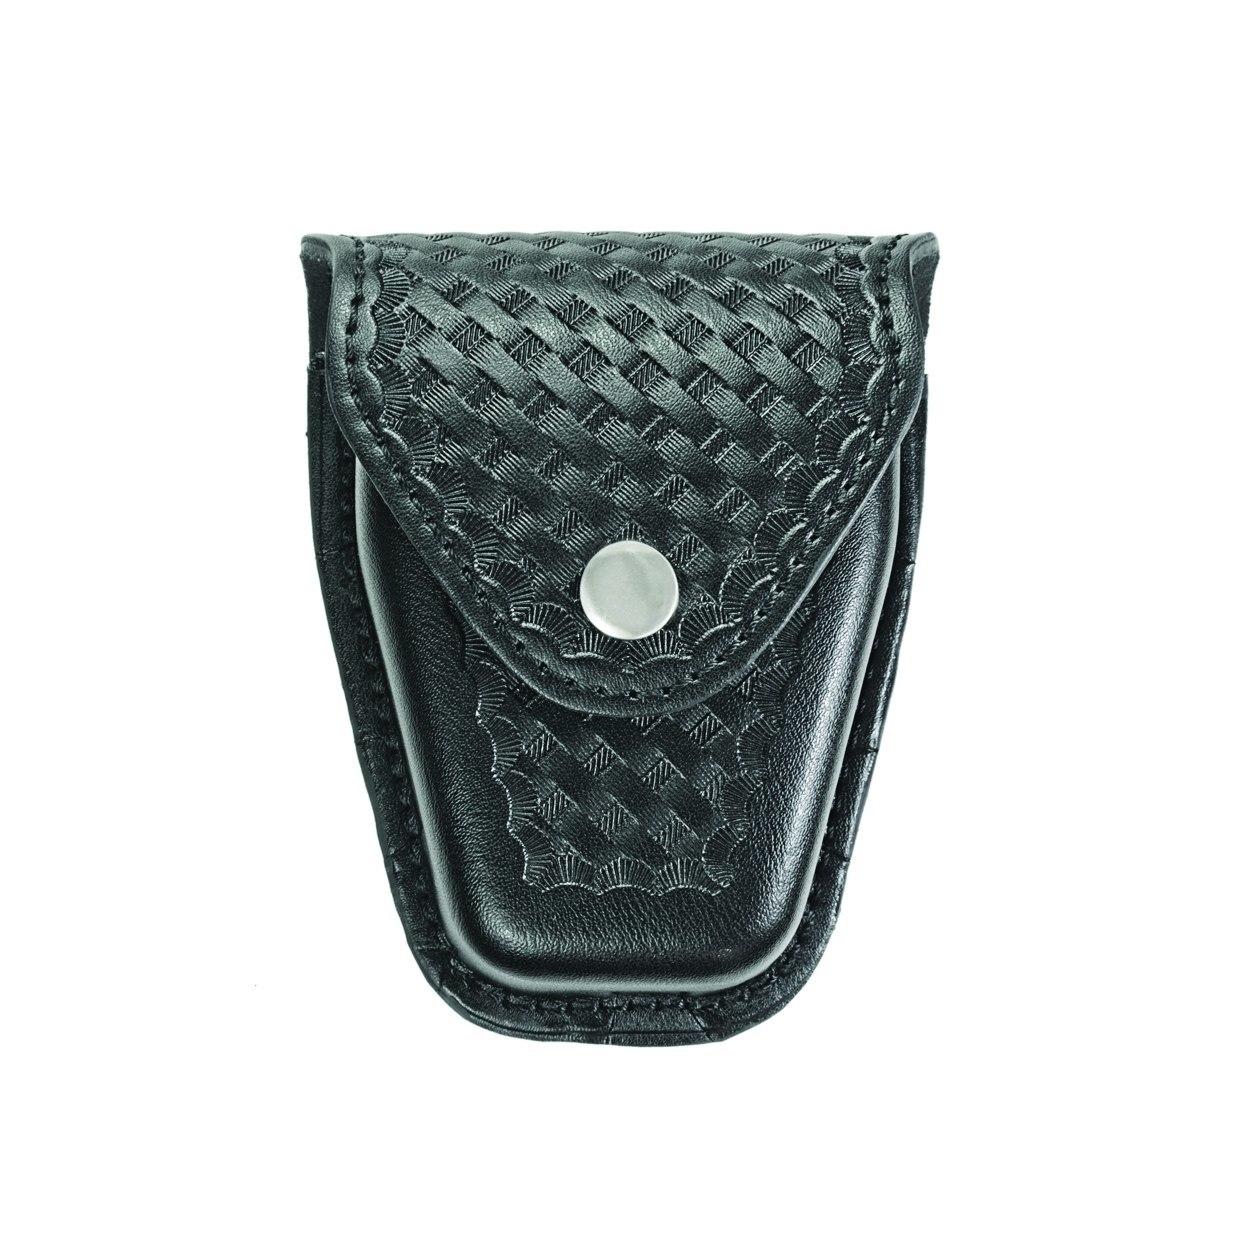 Handcuff Case, Double, Reg & ASP™ Chain, AirTek, BW, Nickel Snap-